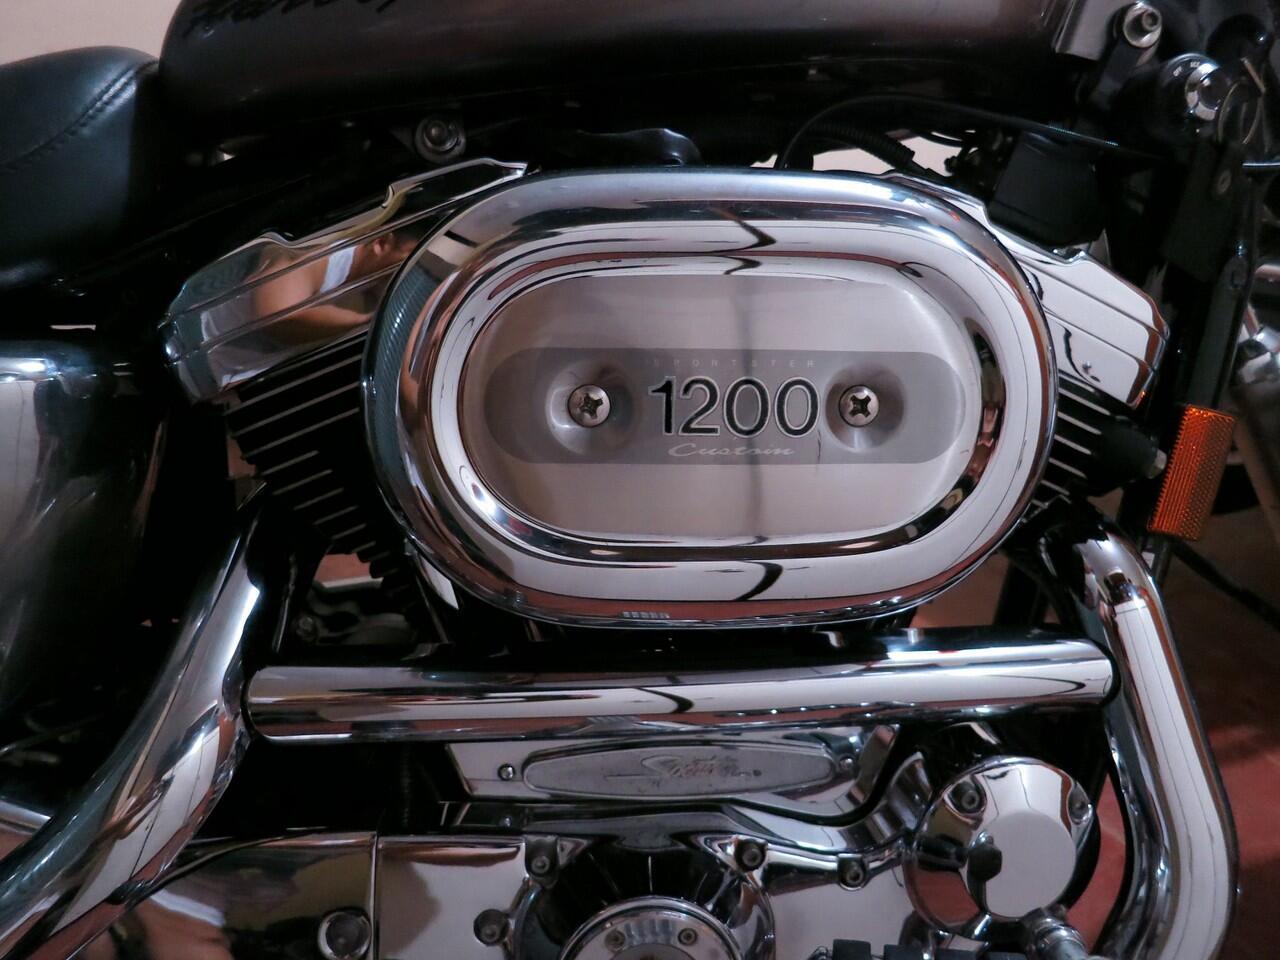 #HARLEY DAVIDSON sporster 1200 SUPERB CONDITION 500 KM 1996#